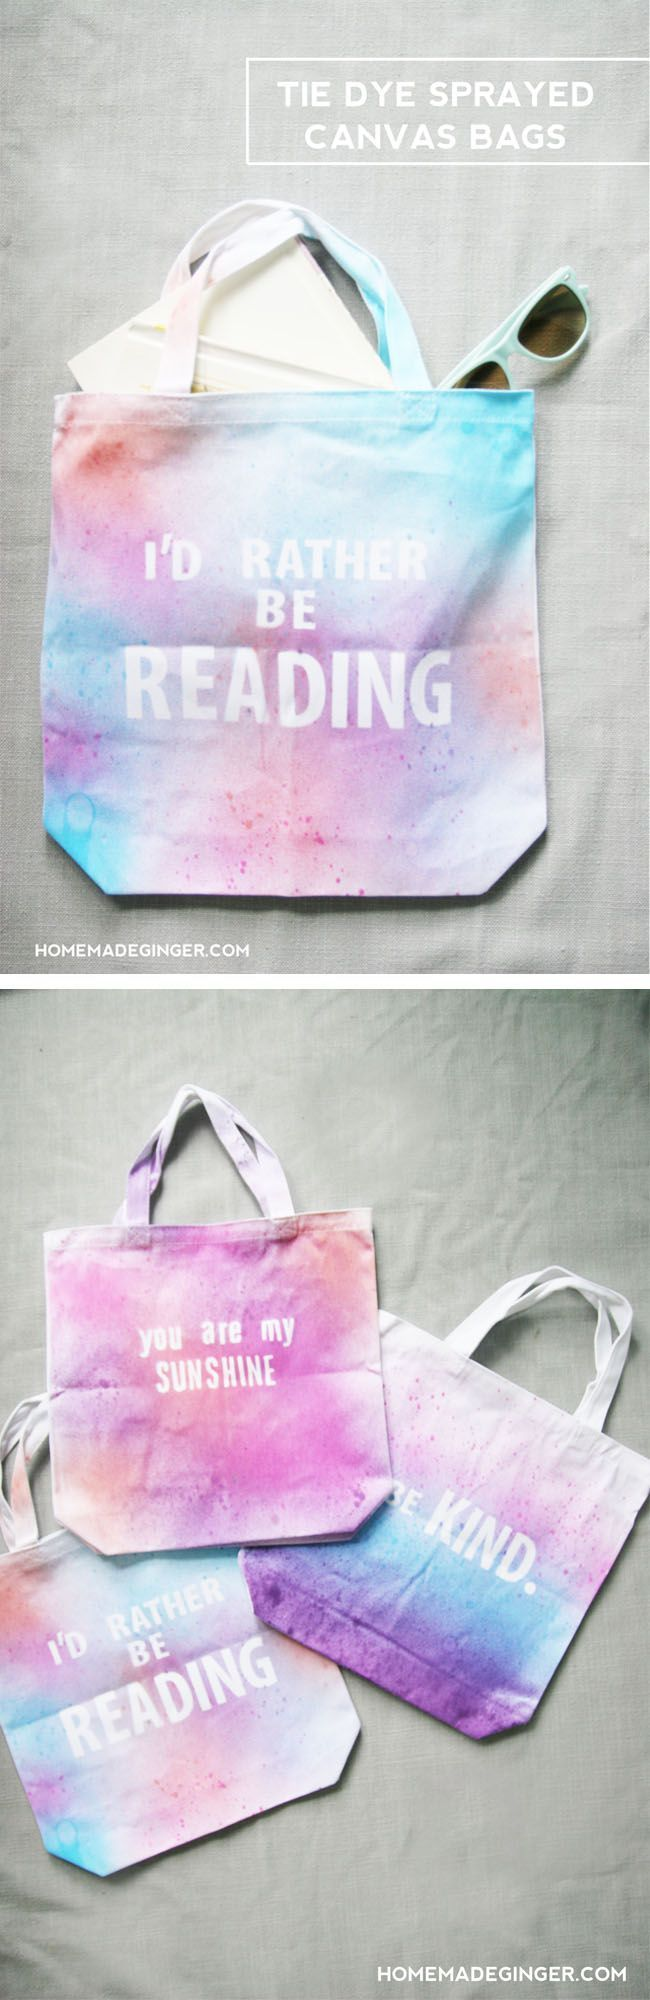 tie dye sprayed canvas bags